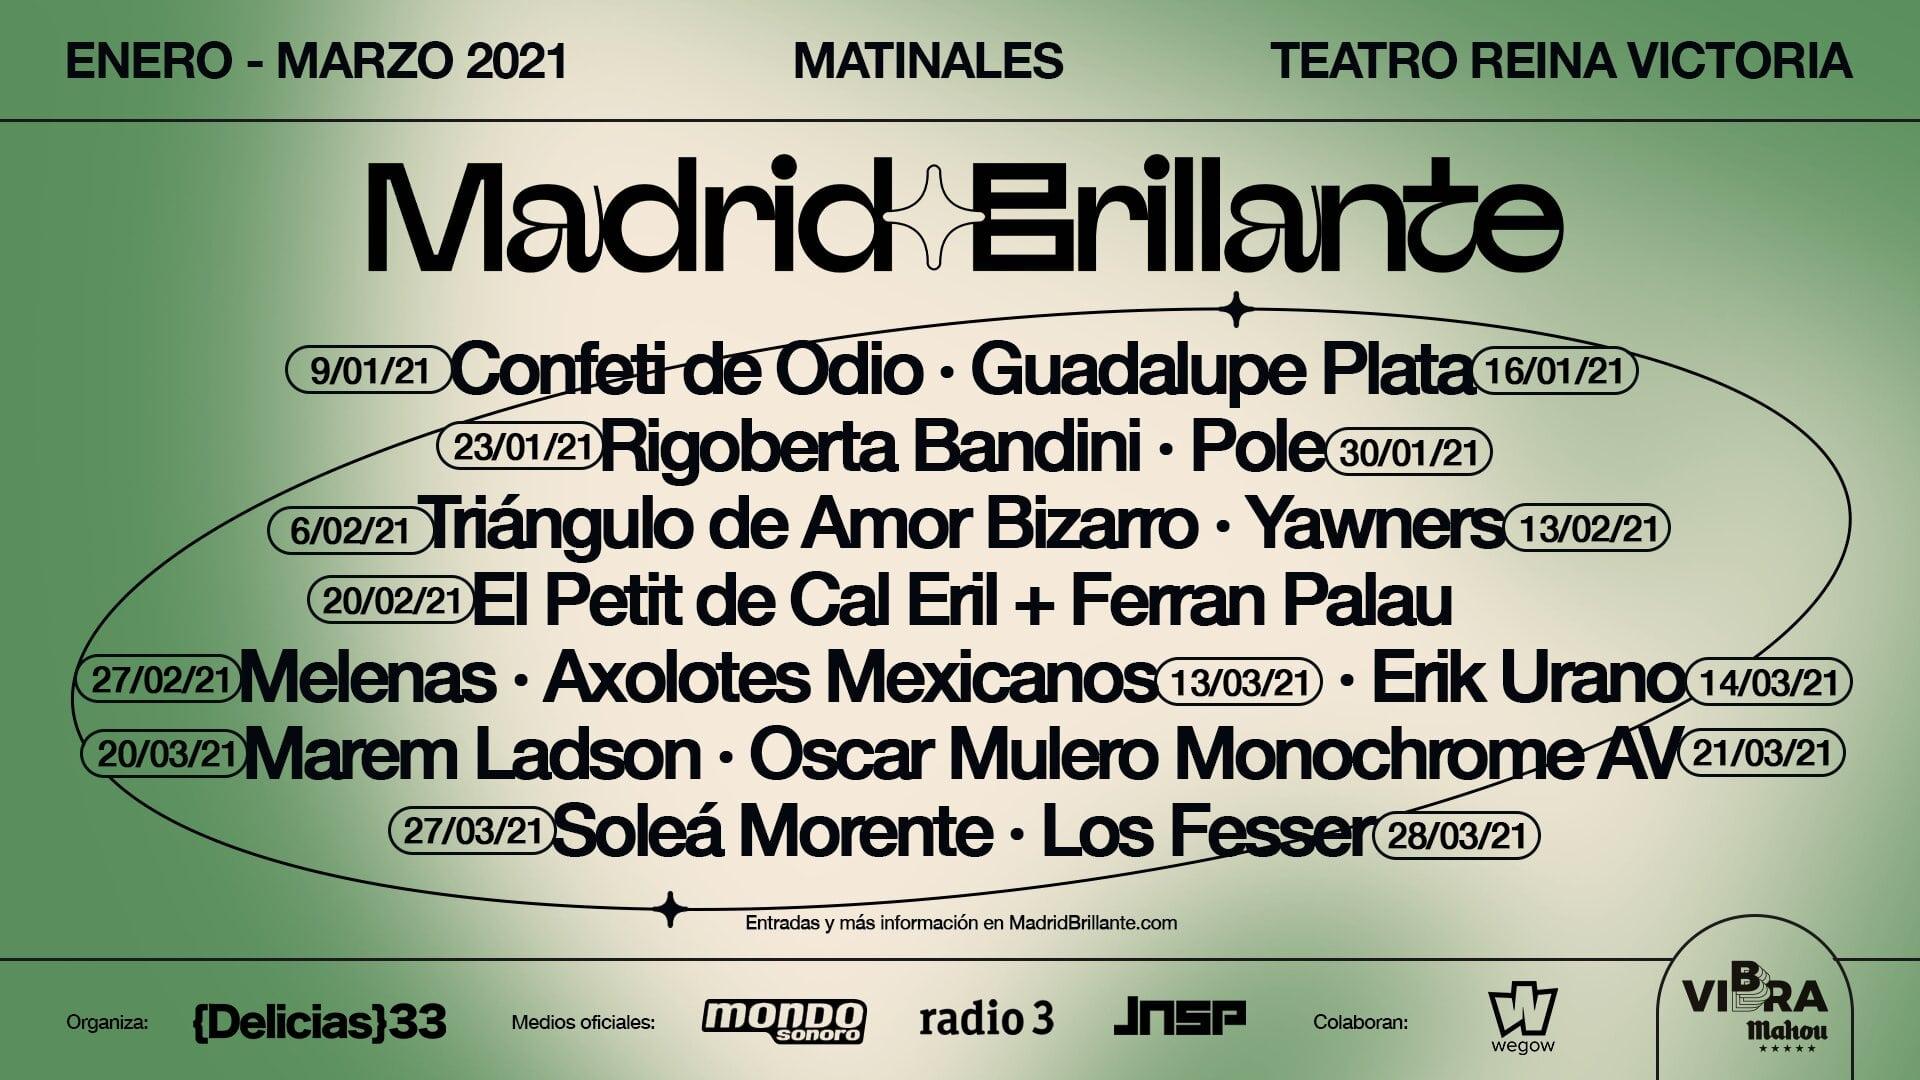 MADRID-BRILLANTE-VIBRA-MAHOU-REINA-VICTORIA